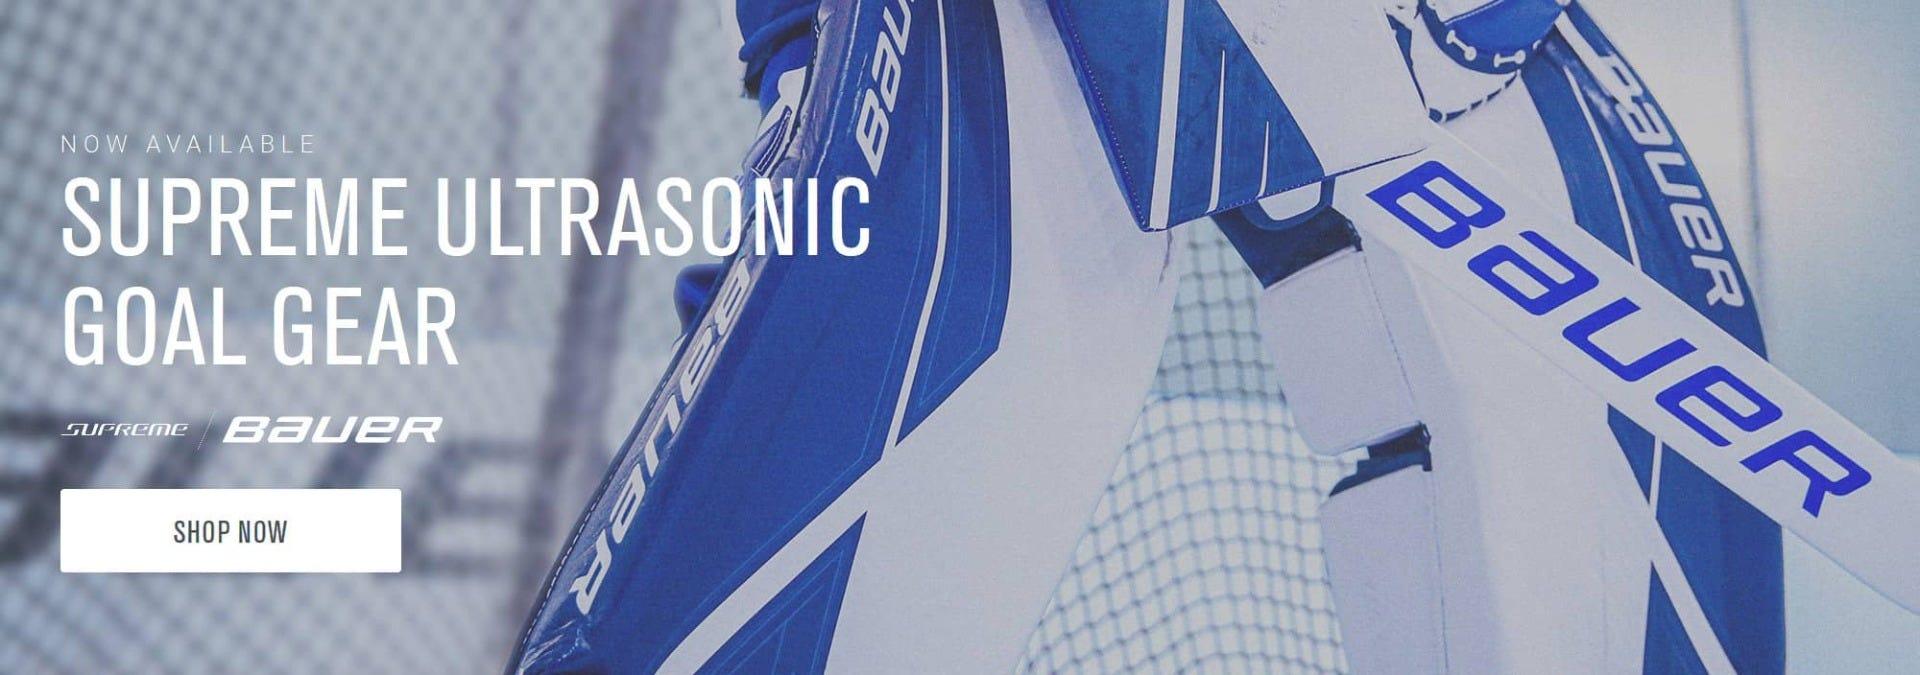 Bauer Supreme Ultrasonic Goalie Equipment